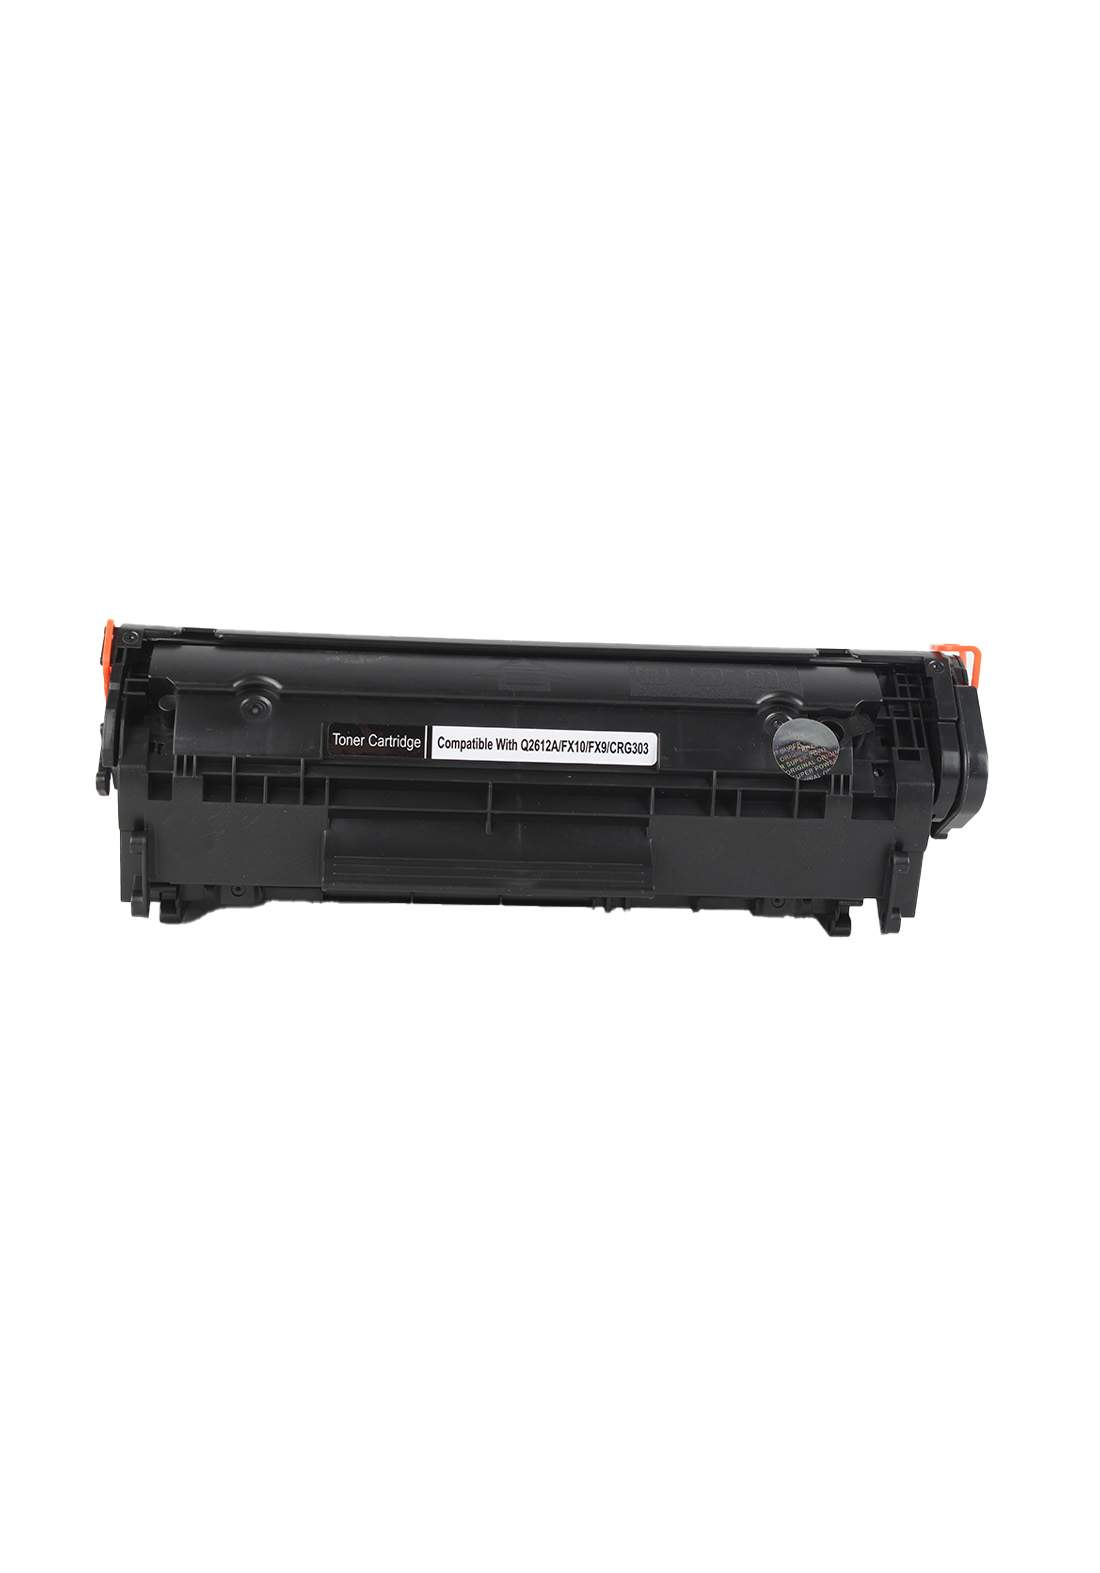 Super Power Plus 303/12A/FX10/FX9  Laser Printer Toner Cartridge خرطوشة حبر